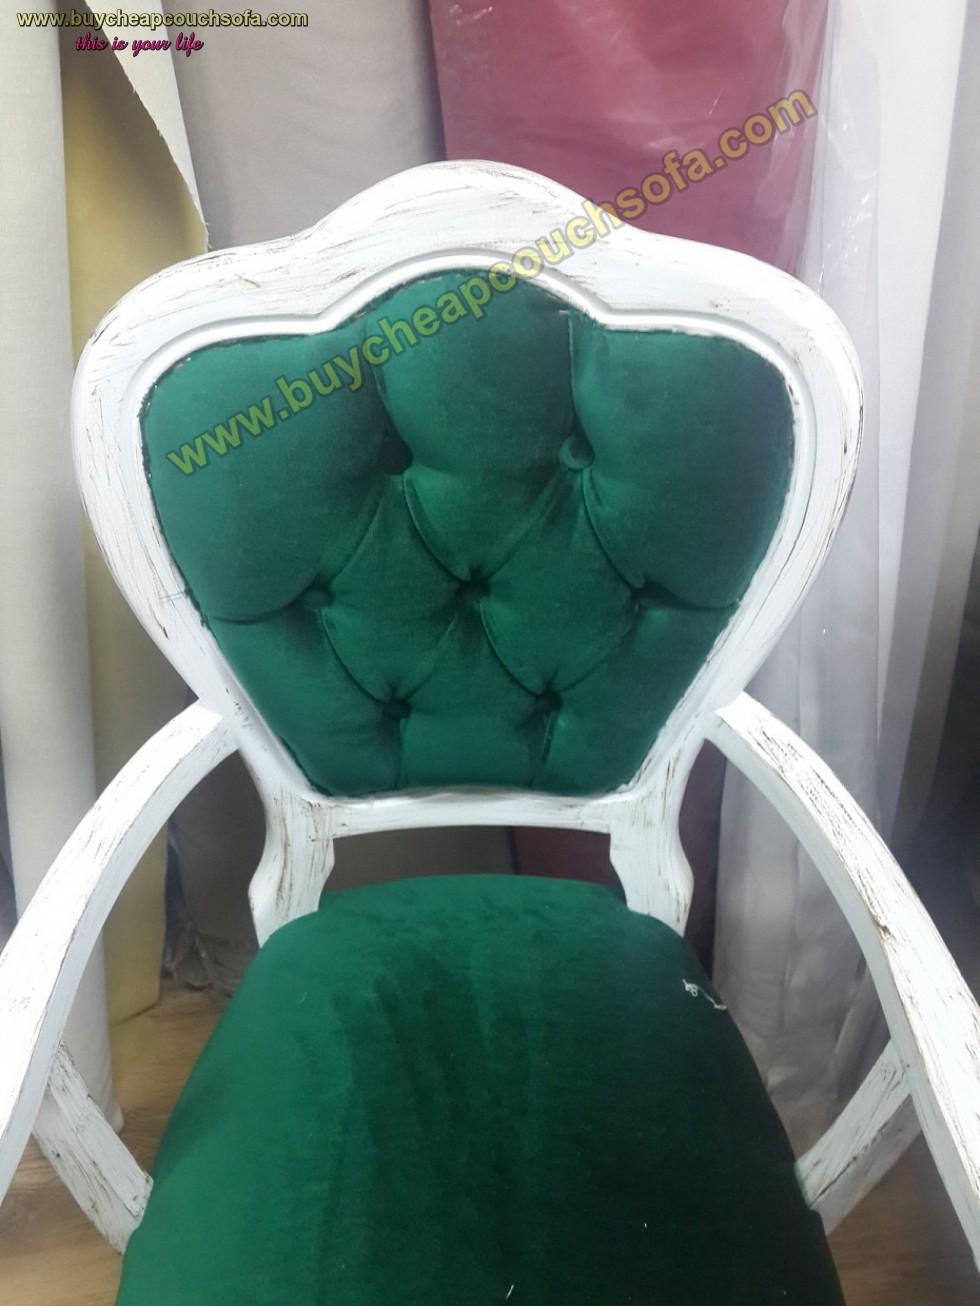 Kodu: 10239 - Antique Luxury Accent Chair Green Velvet White Antique Polished